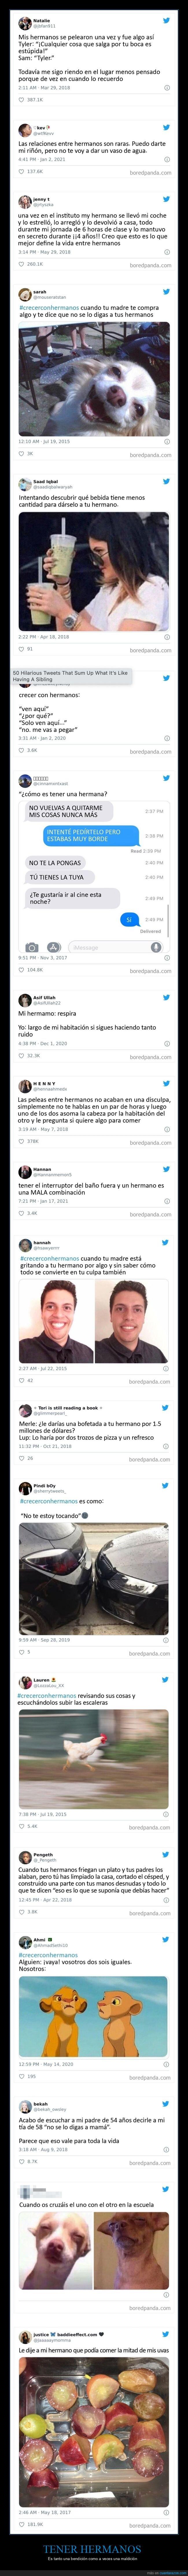 hermanos,tweets